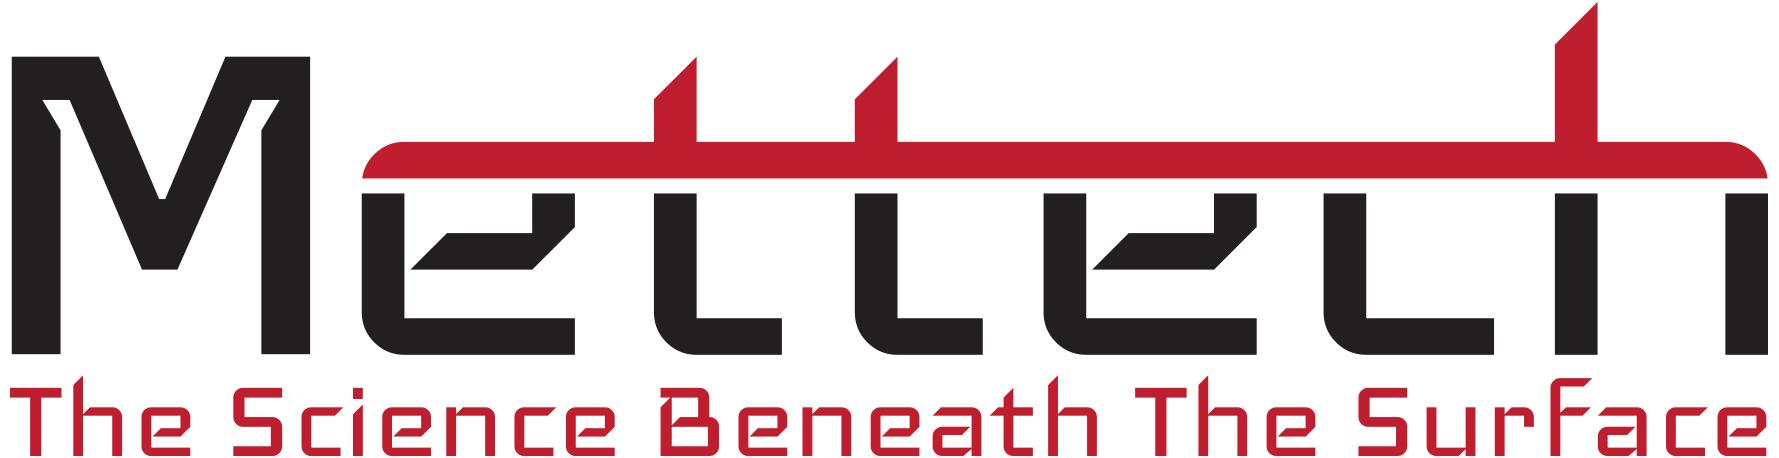 Mettech-Logo